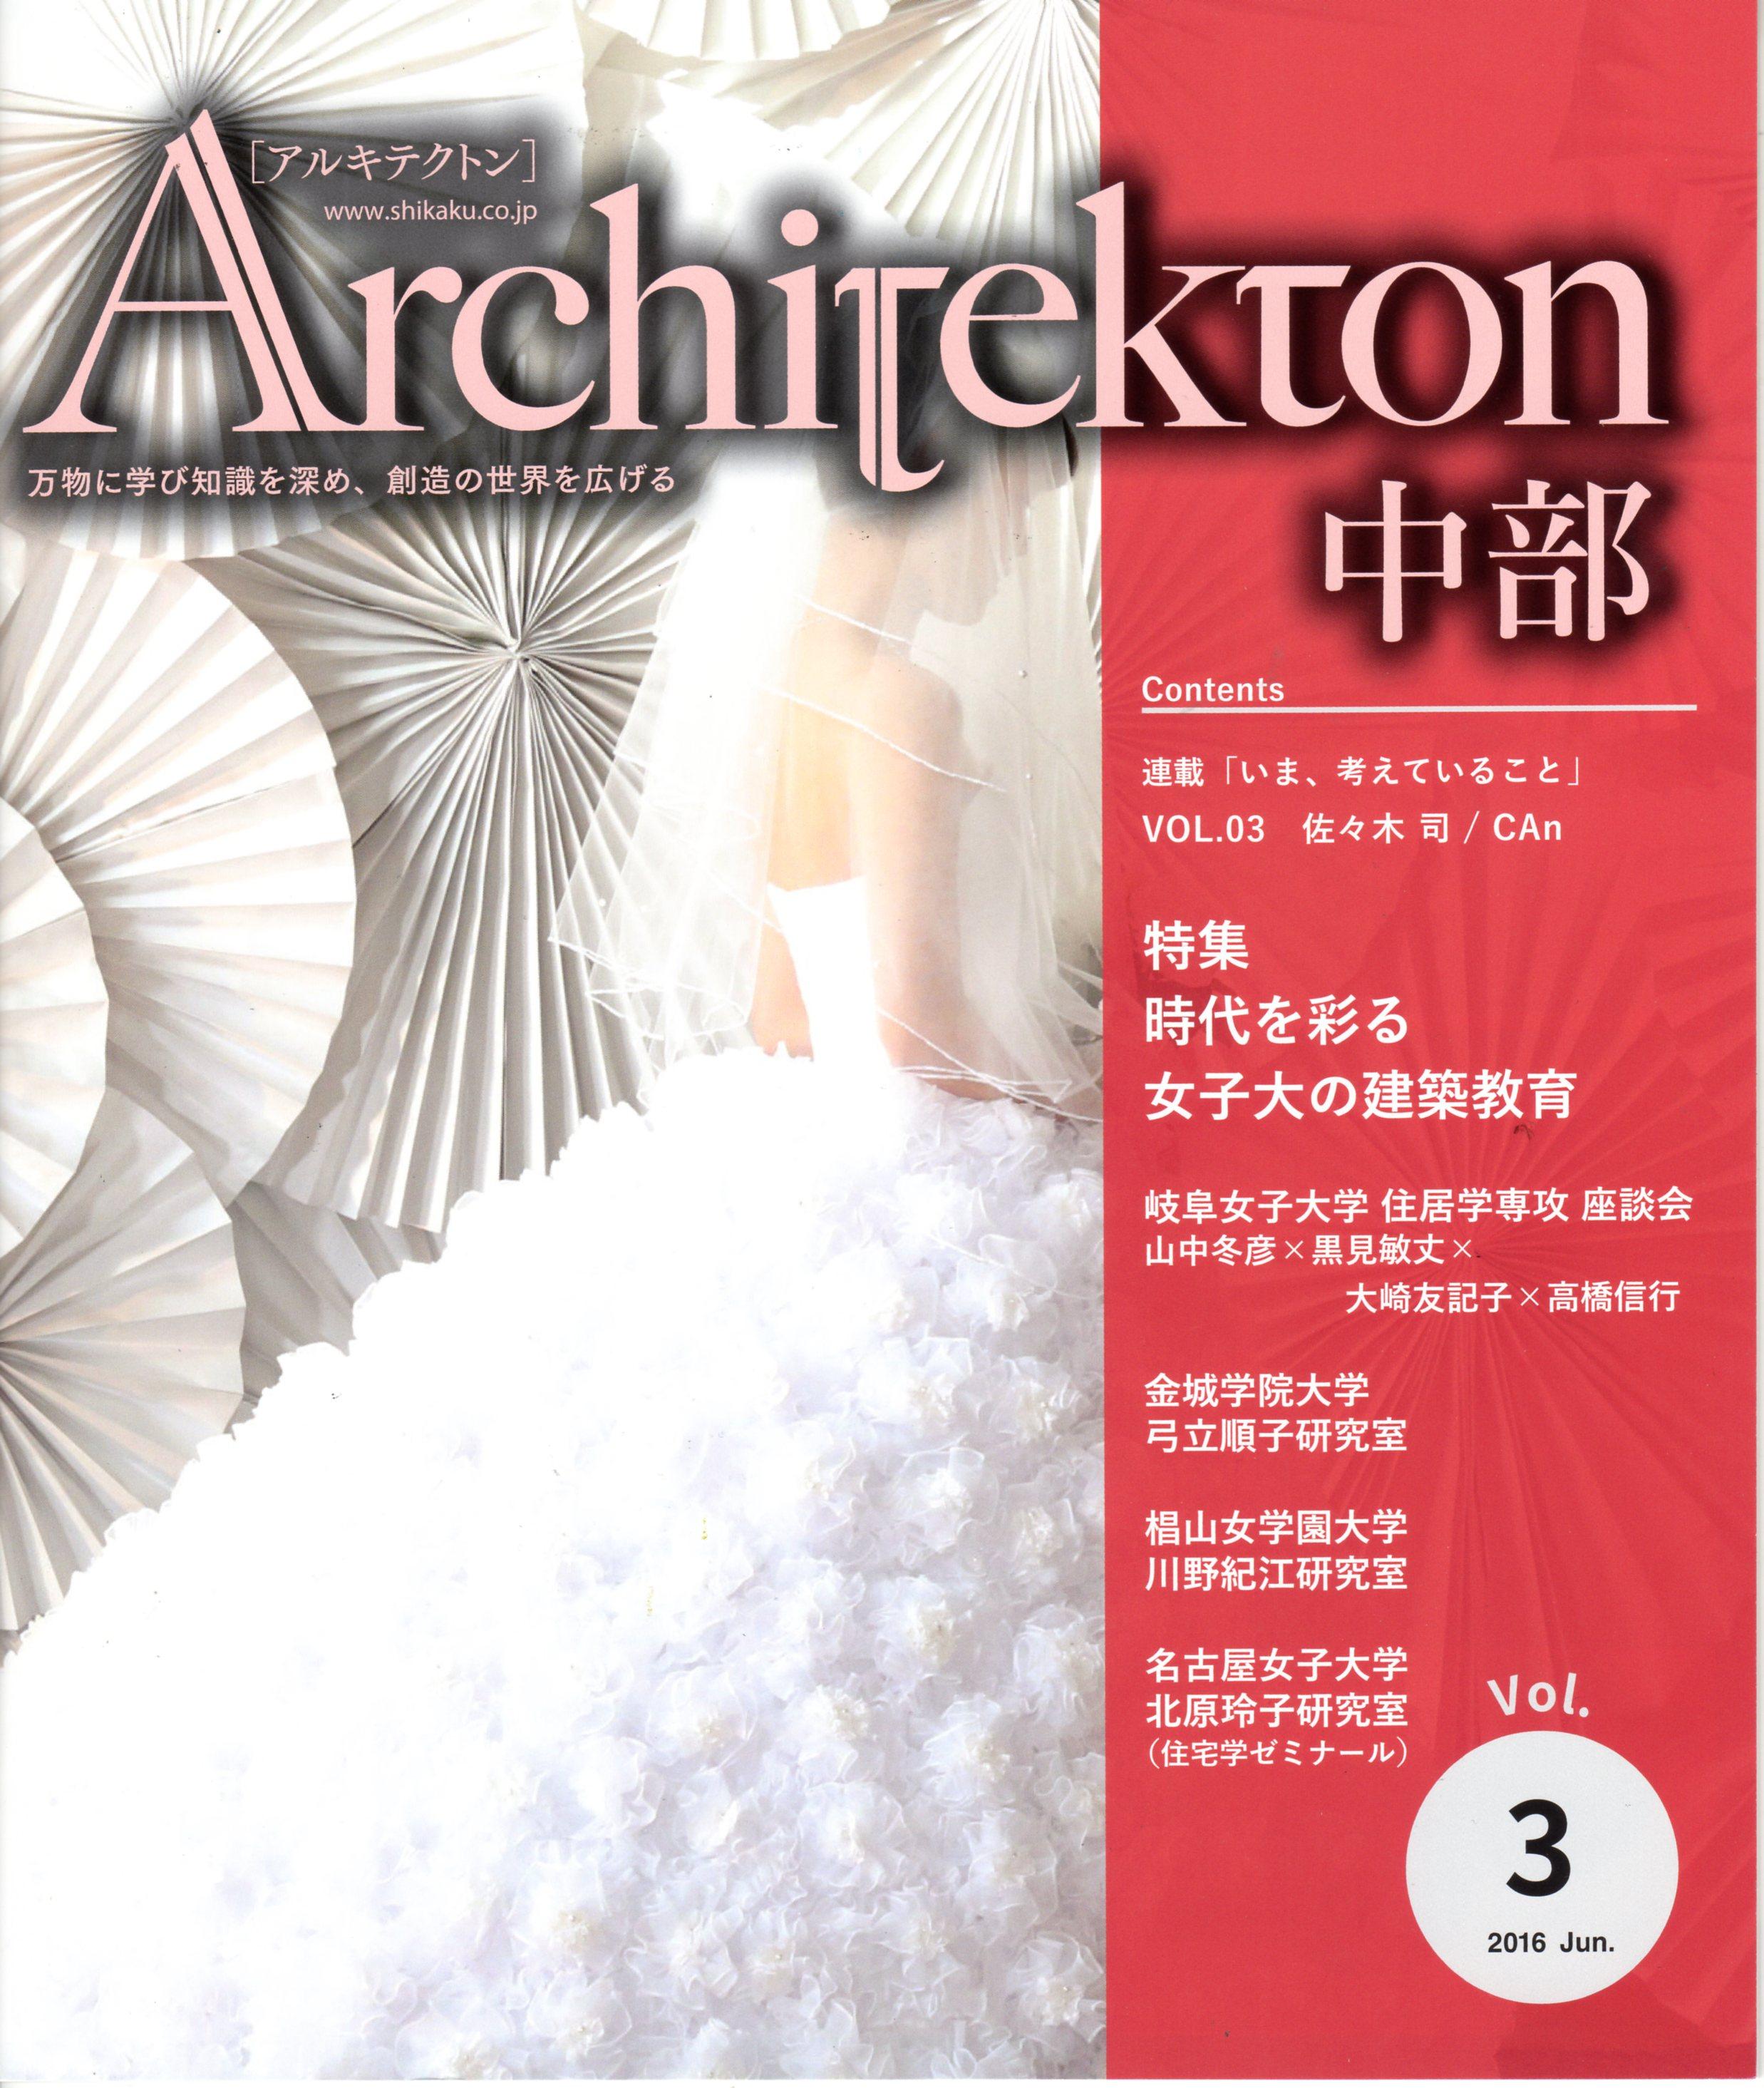 Architeckton 中部 vol.3